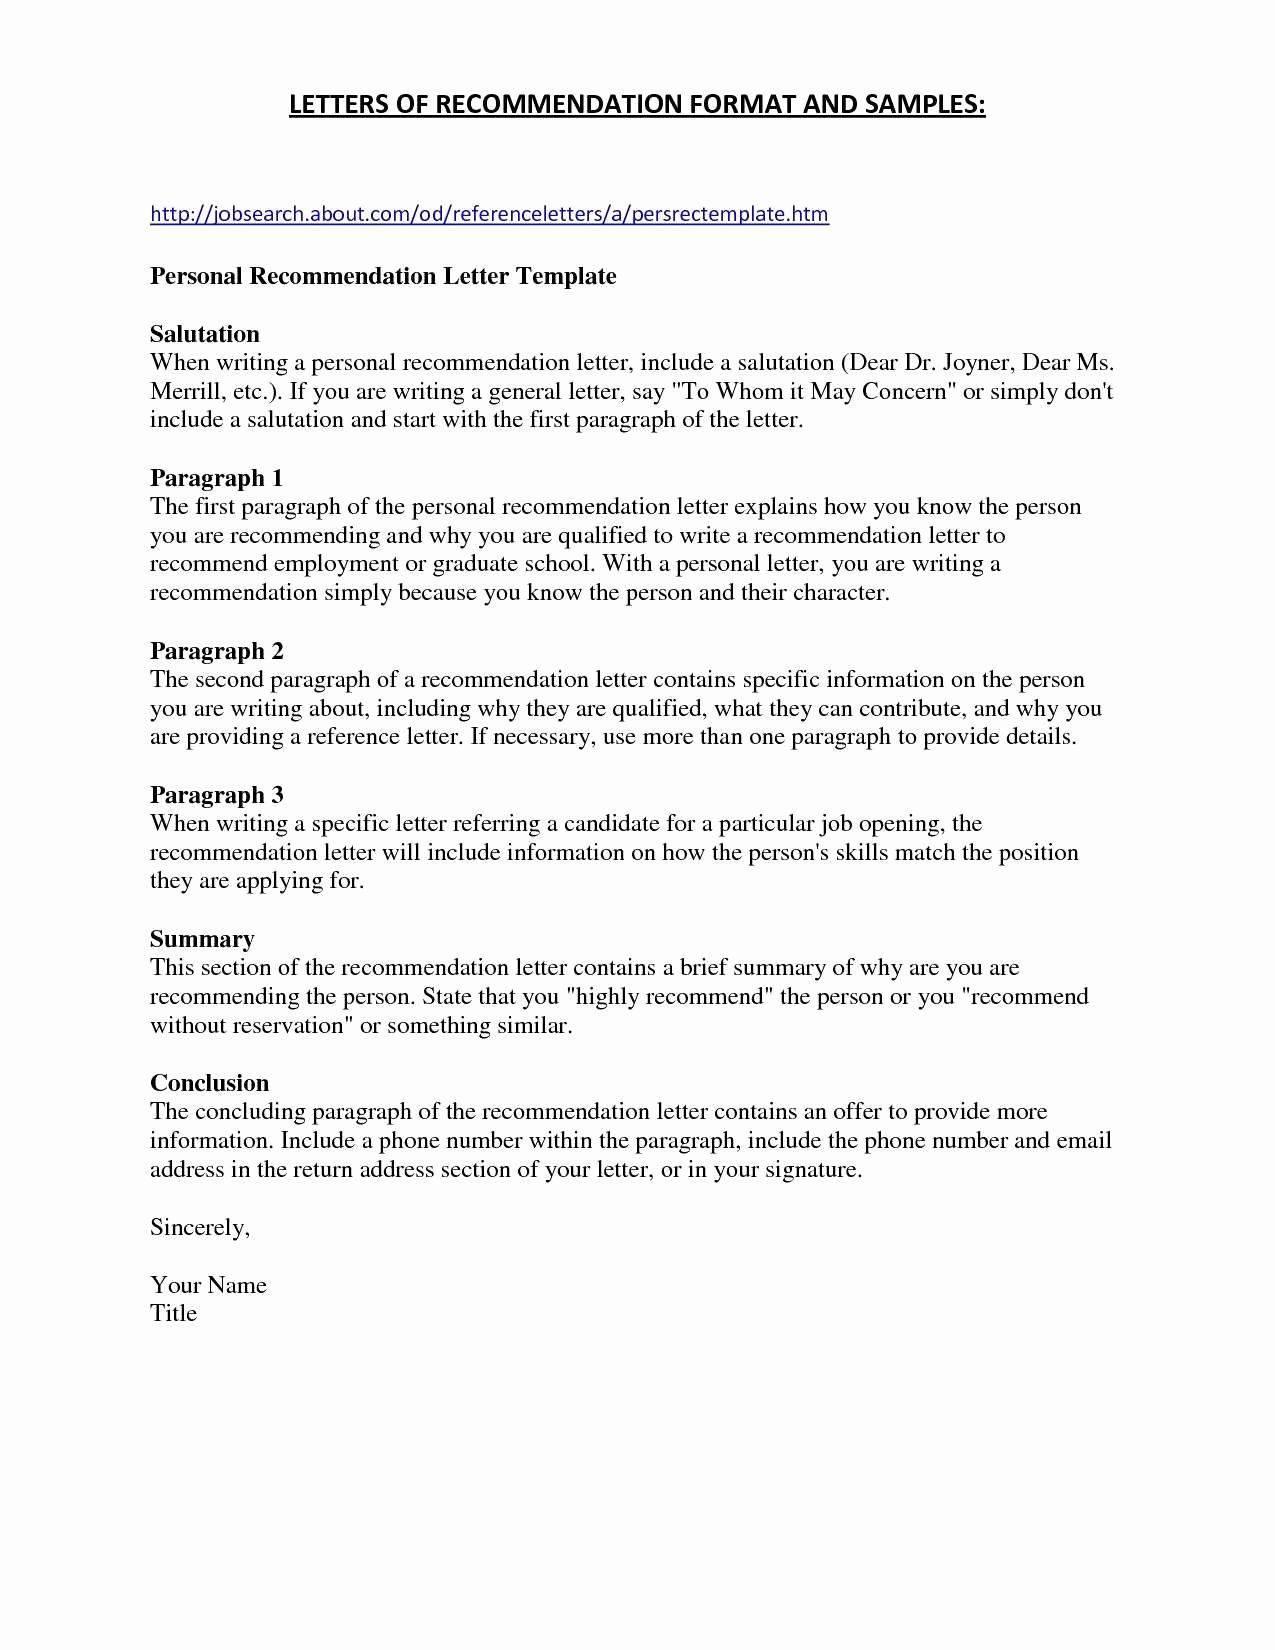 Resume Draft Template